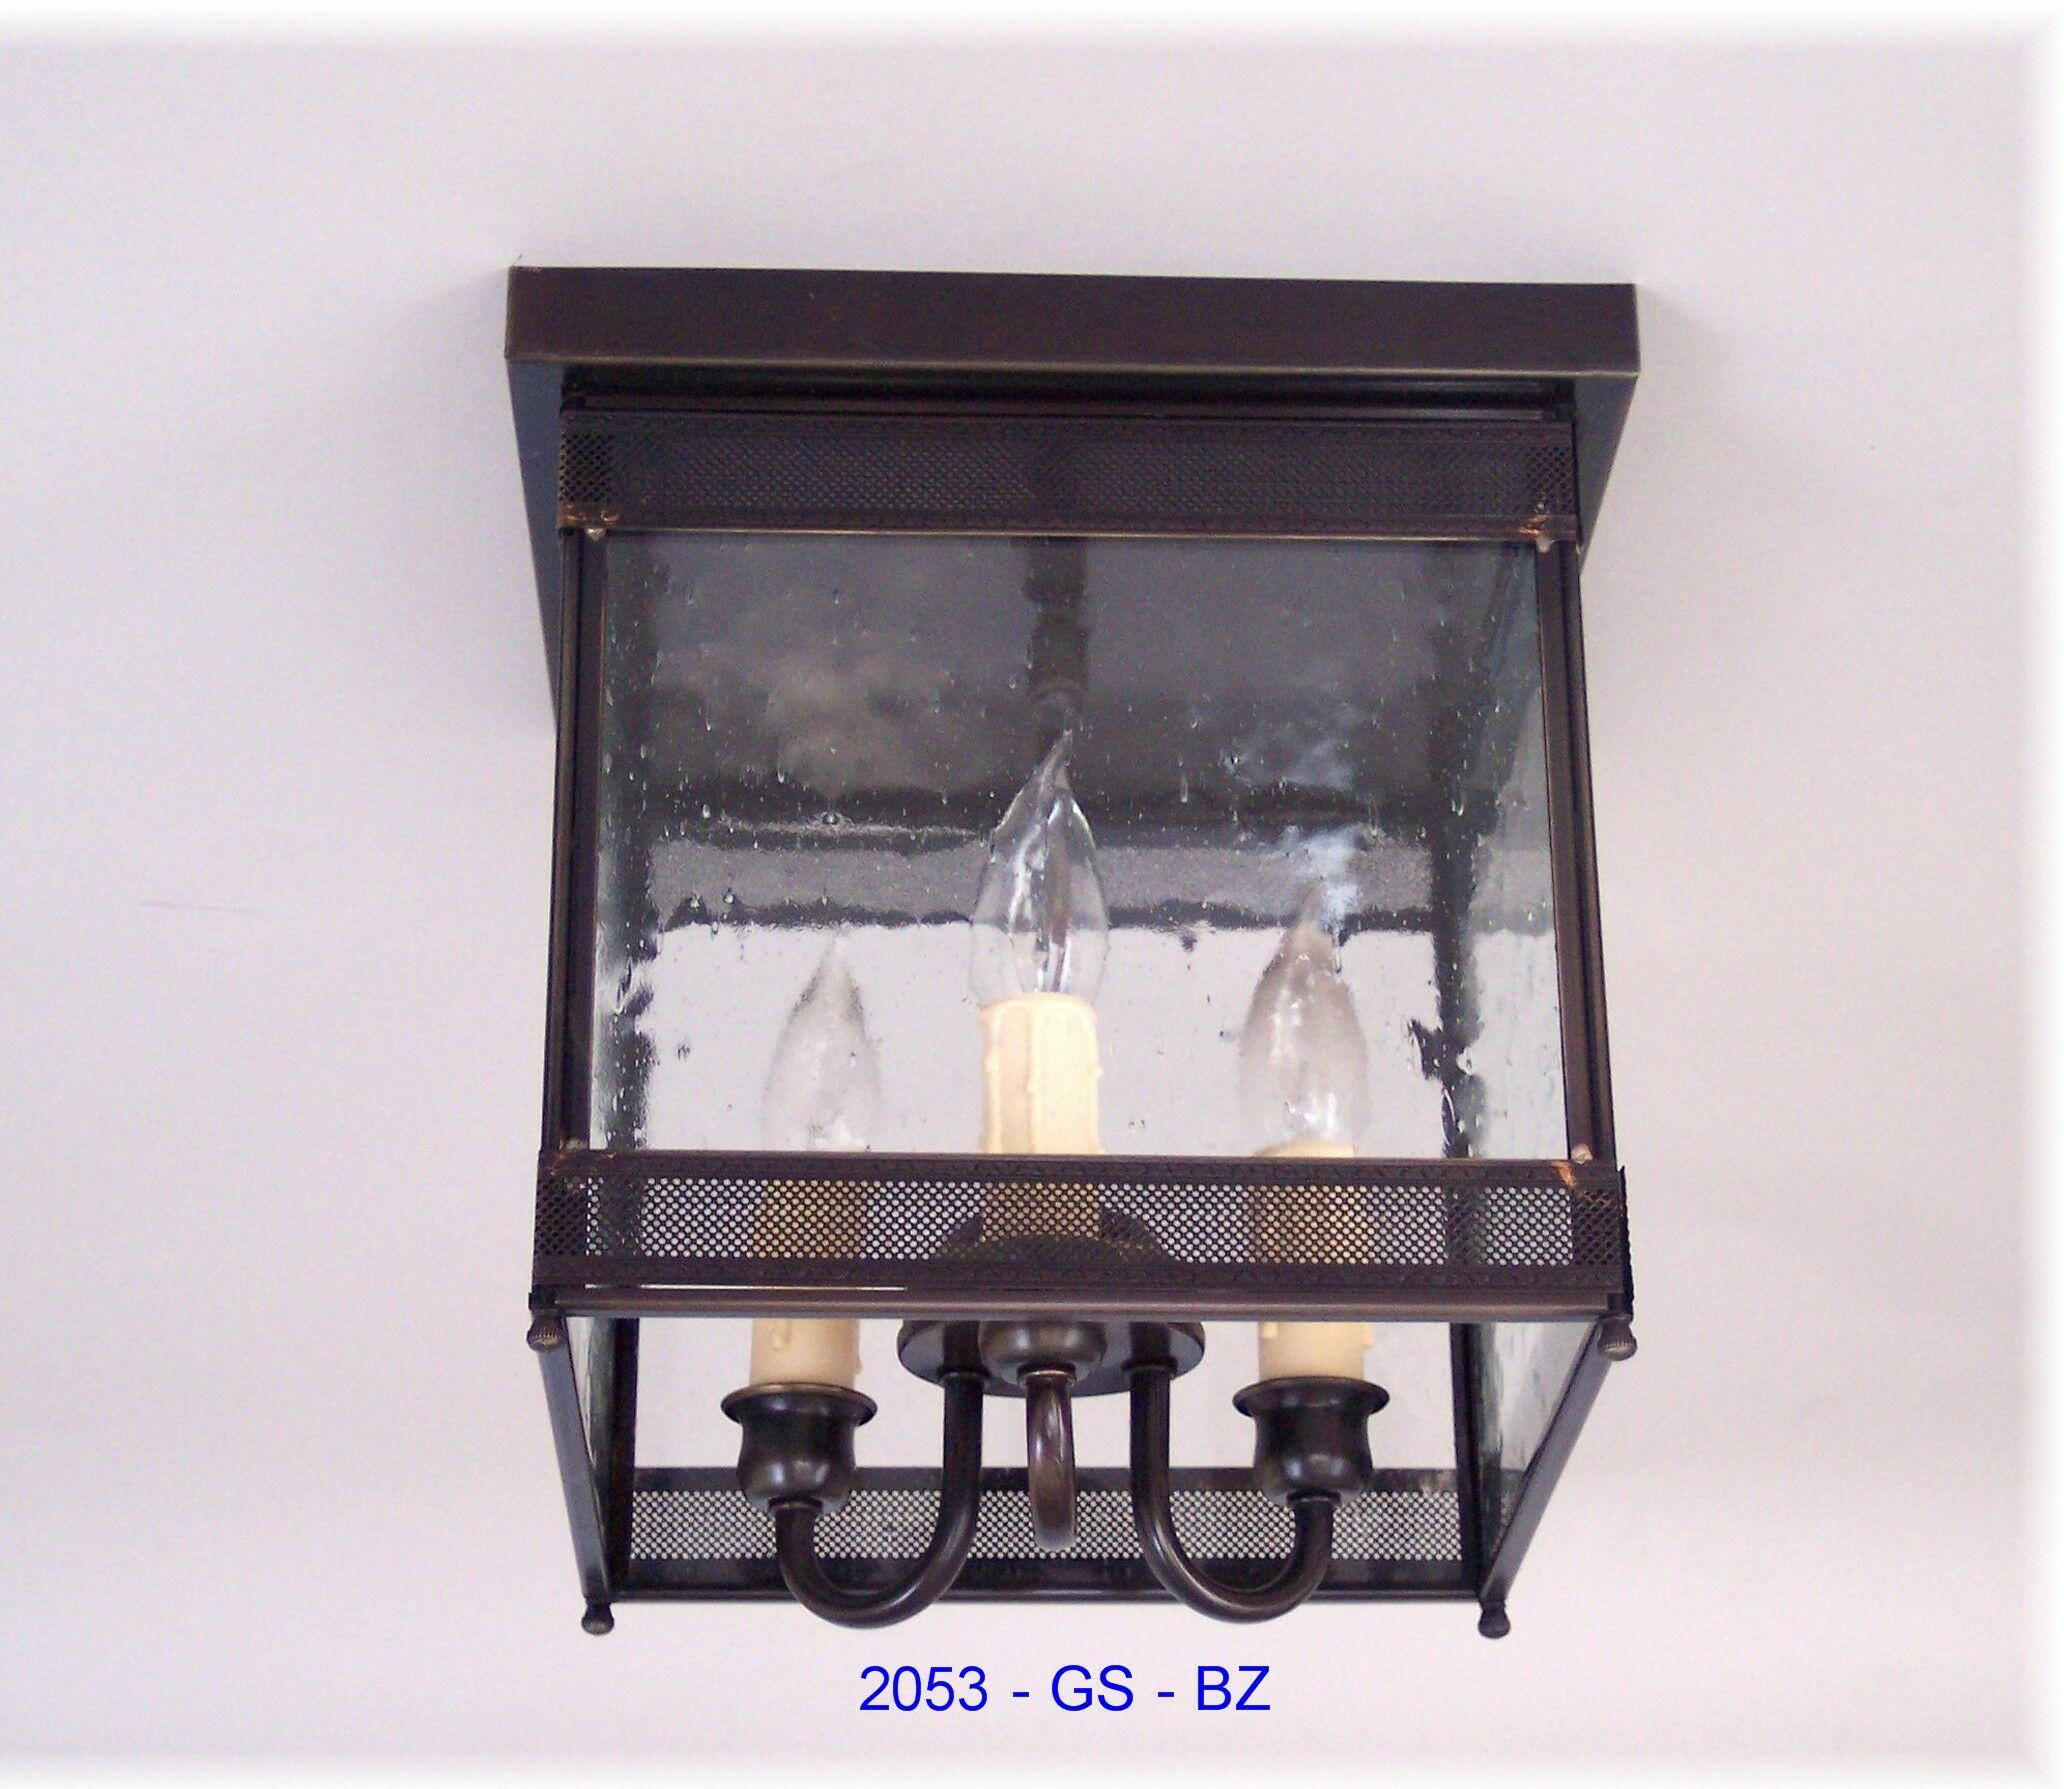 Erroll 3-Light Outdoor Flush Mount Fixture Finish: Dark Antique Brass, Shade Color: Drawn Antique